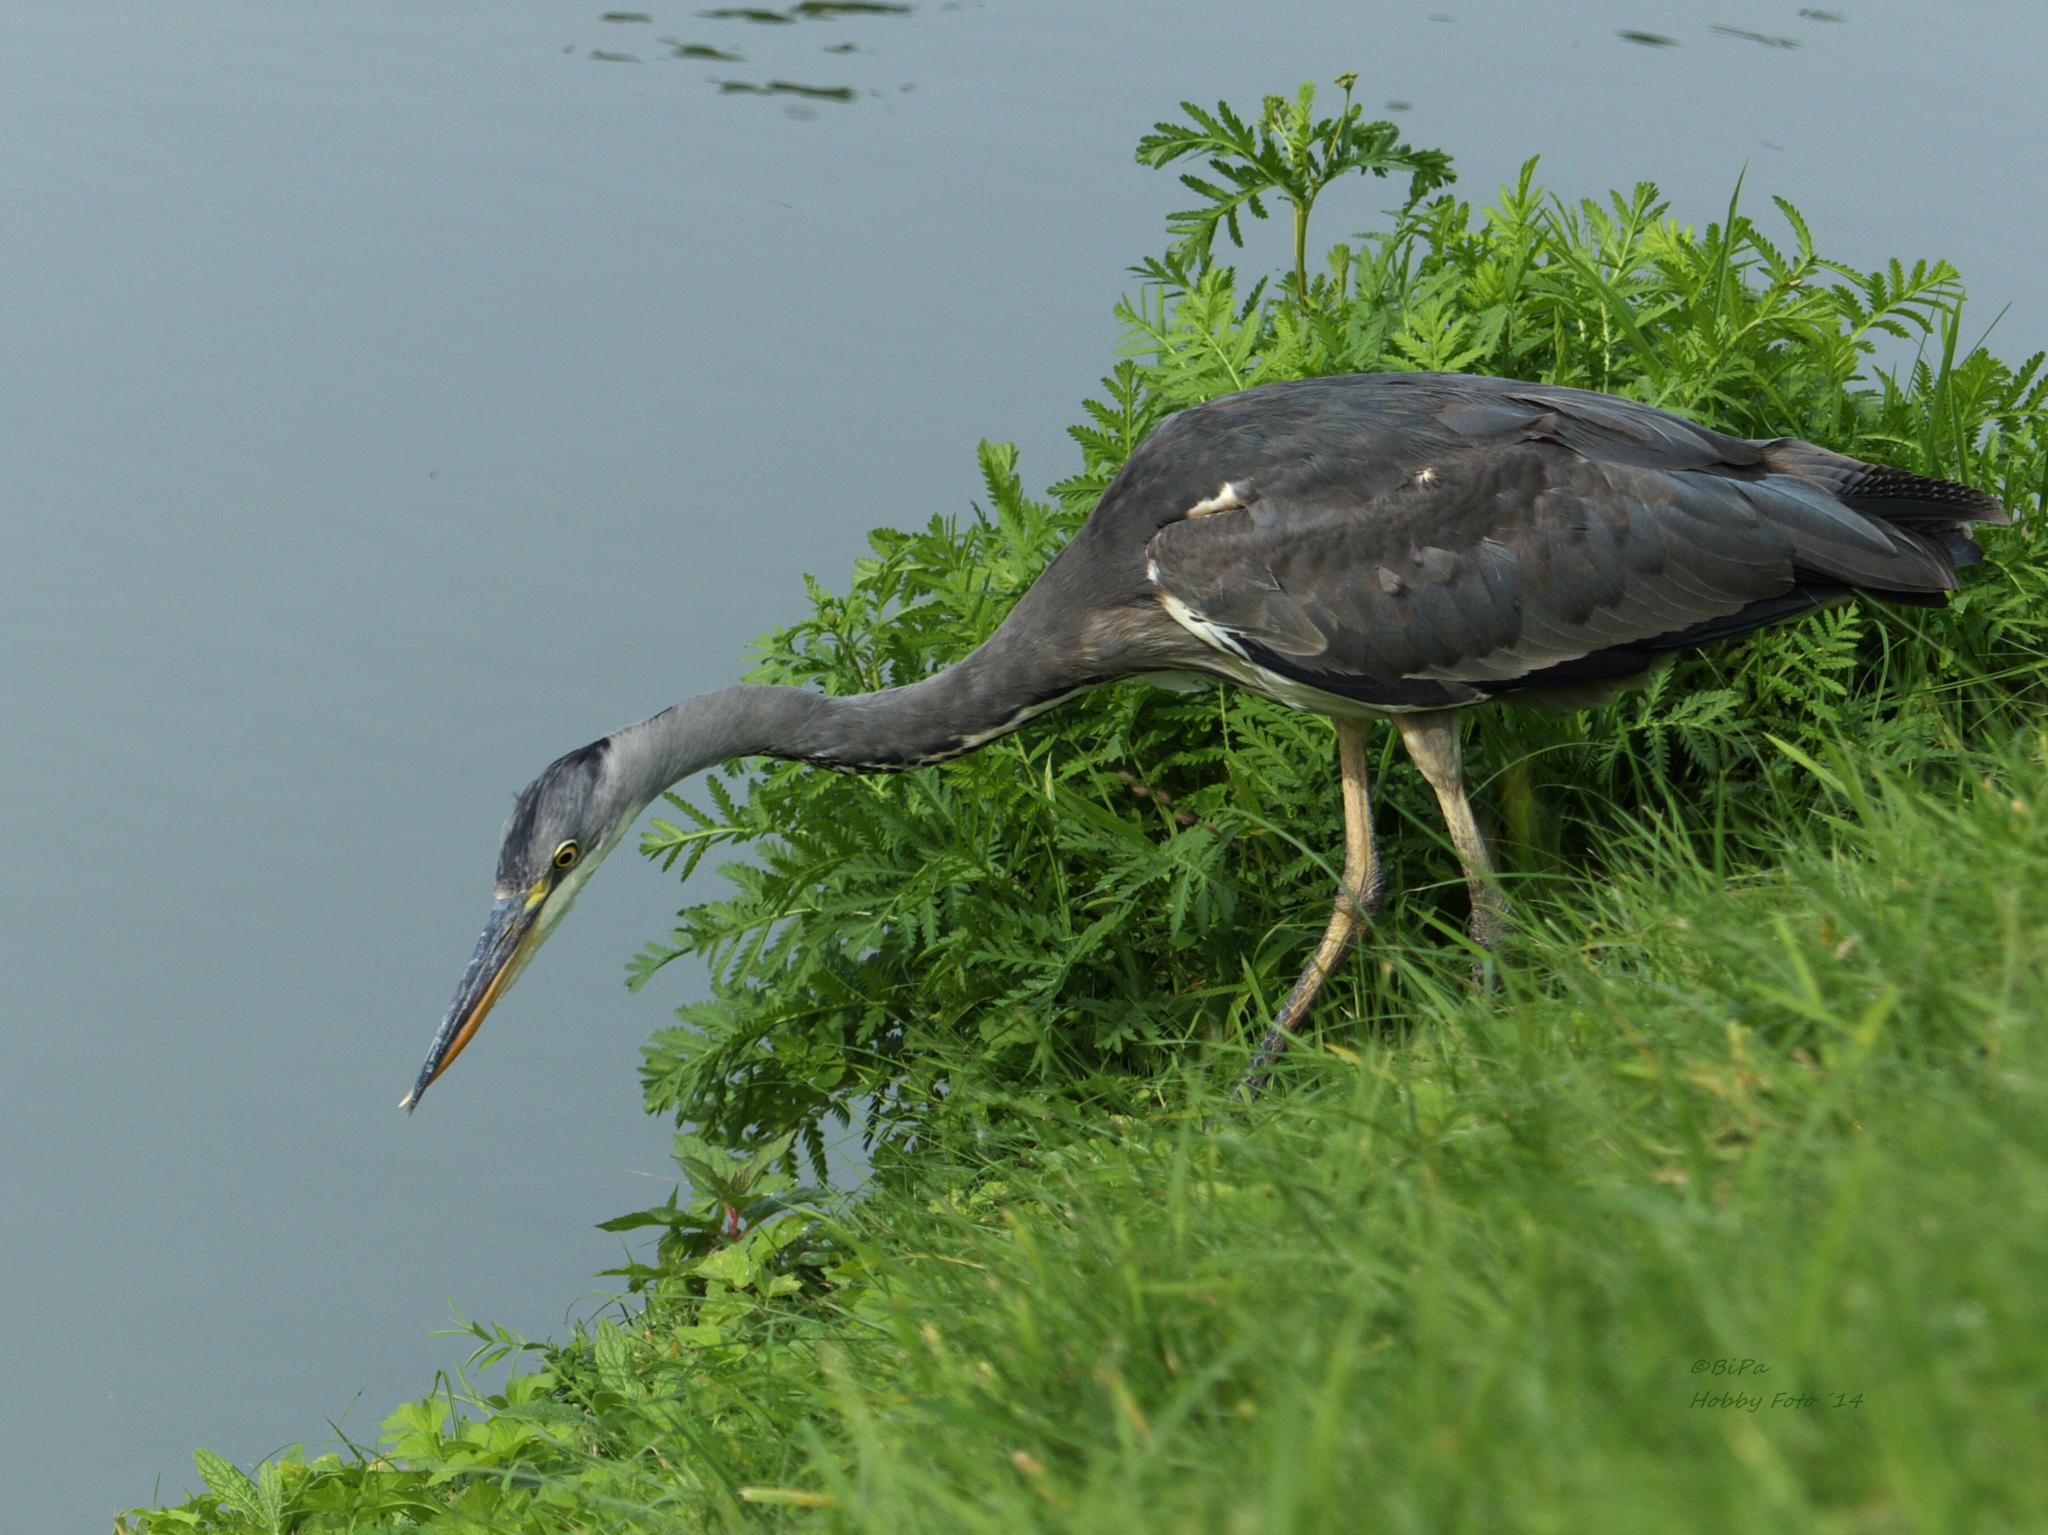 Observation of prey by Biri